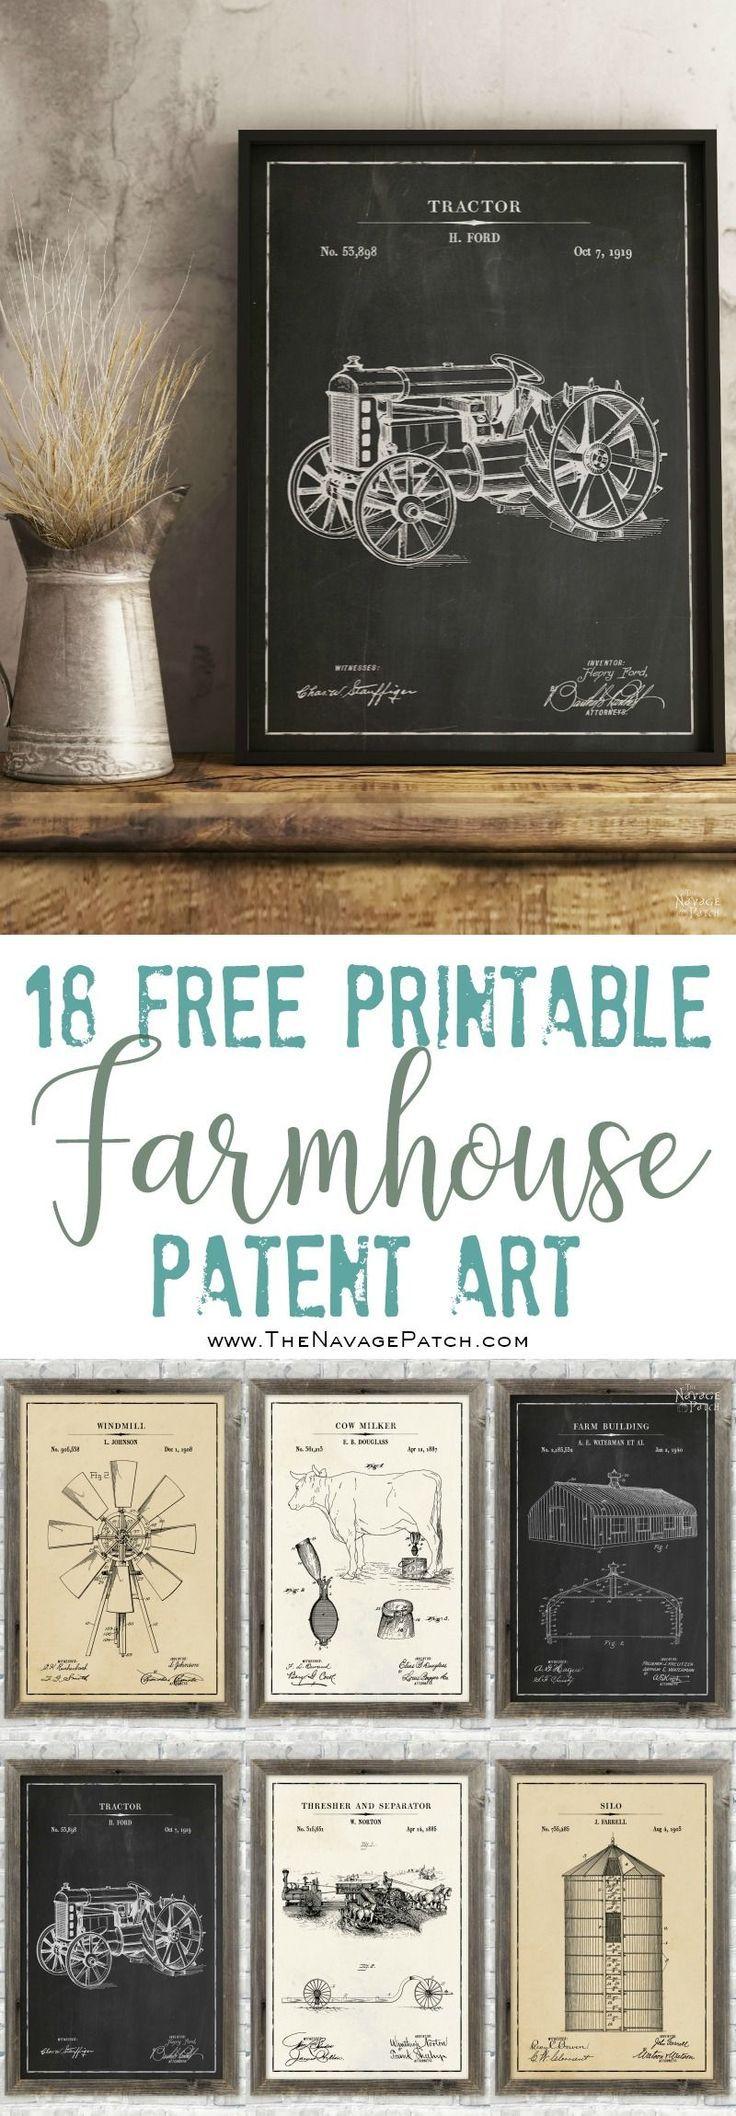 Farmhouse Patent Art and Surprise Bonus Printables